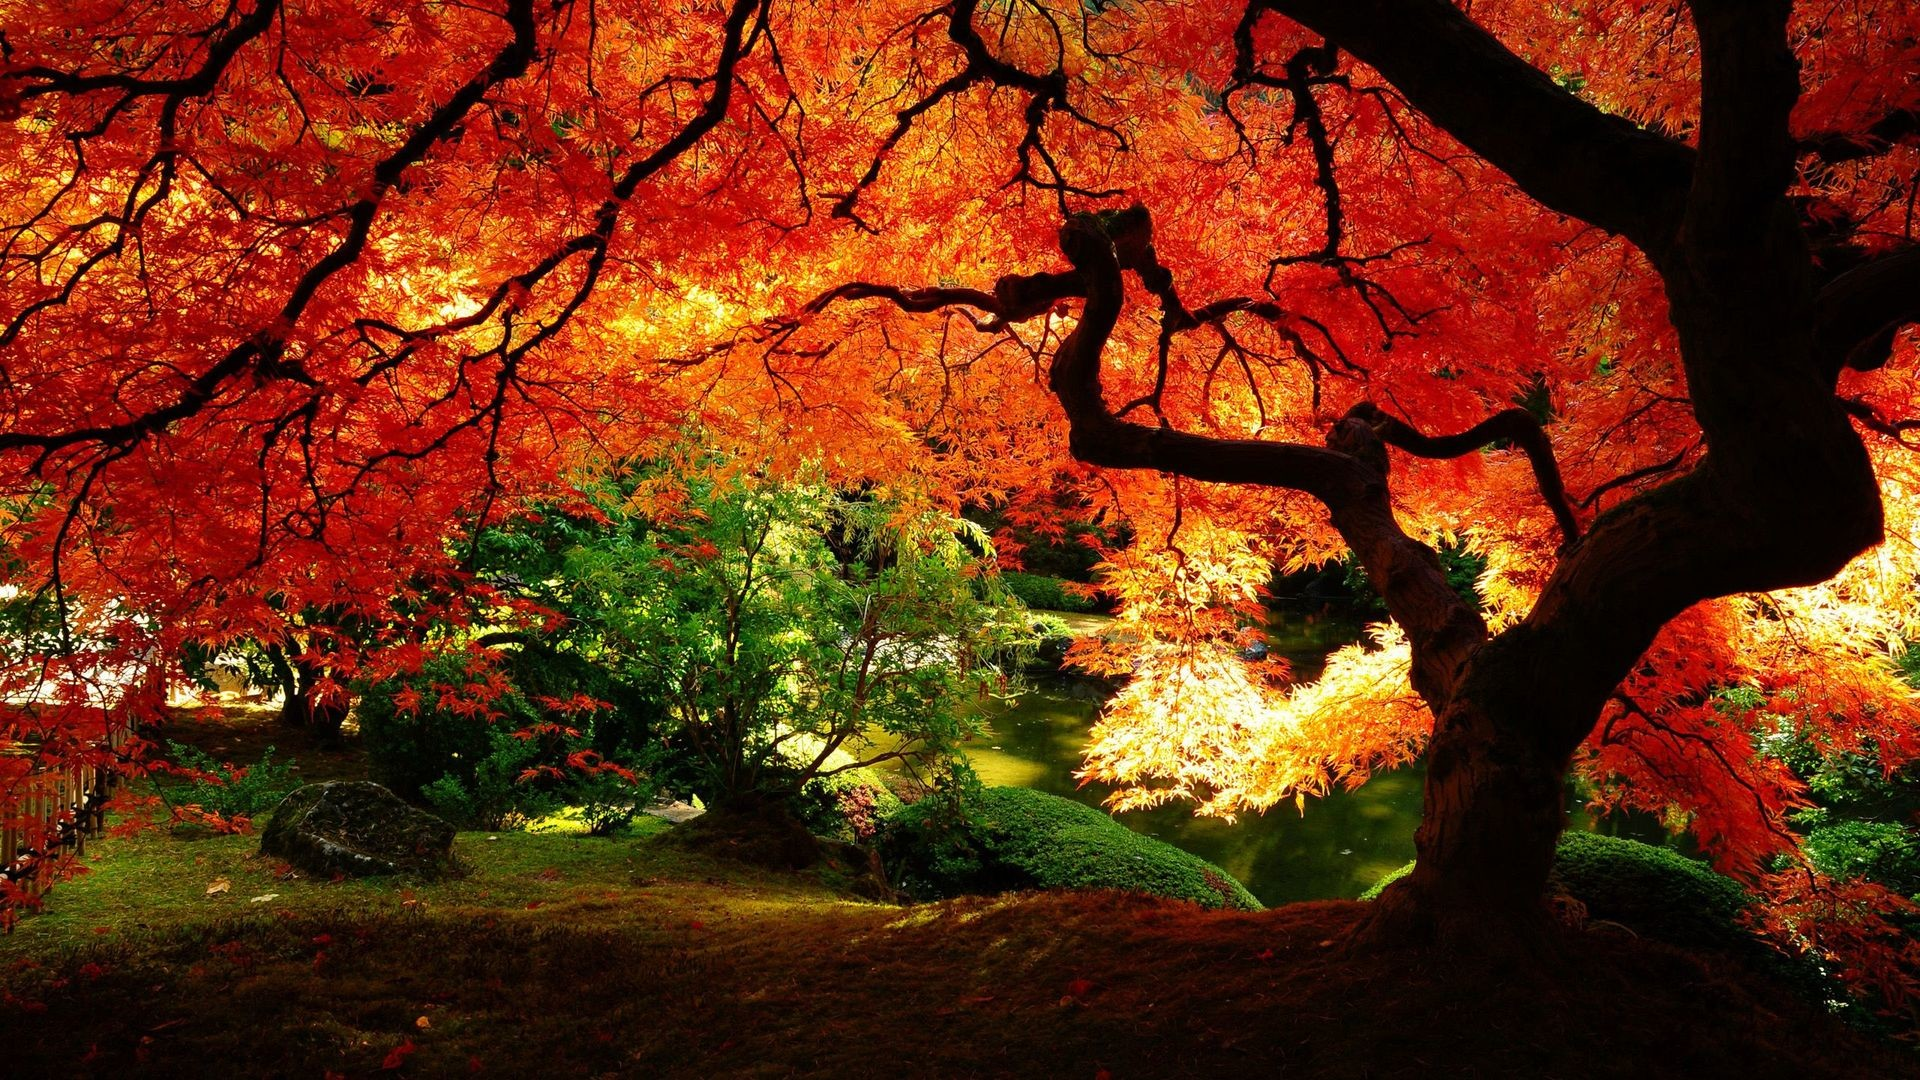 Res: 1920x1080, High Resolution Tree Autumn Wallpaper HD Full Size - SiWallpaperHD .